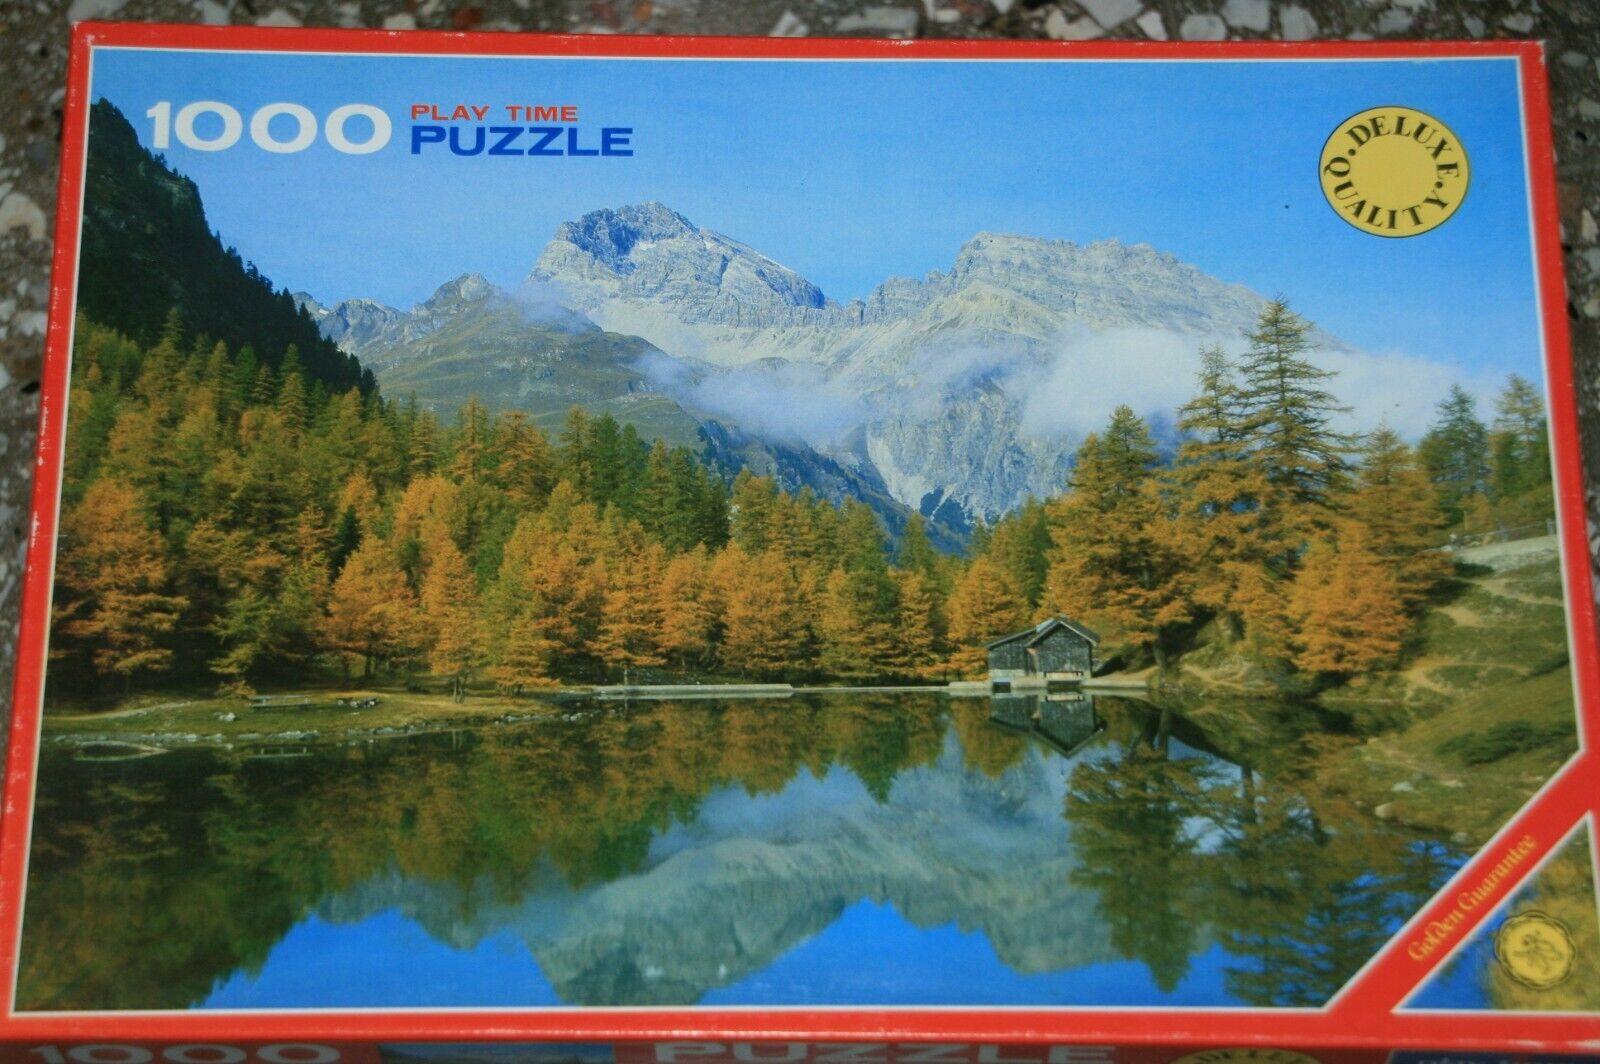 Puzzle 1000 Teile  Lake Az  v. Play Time  TOP